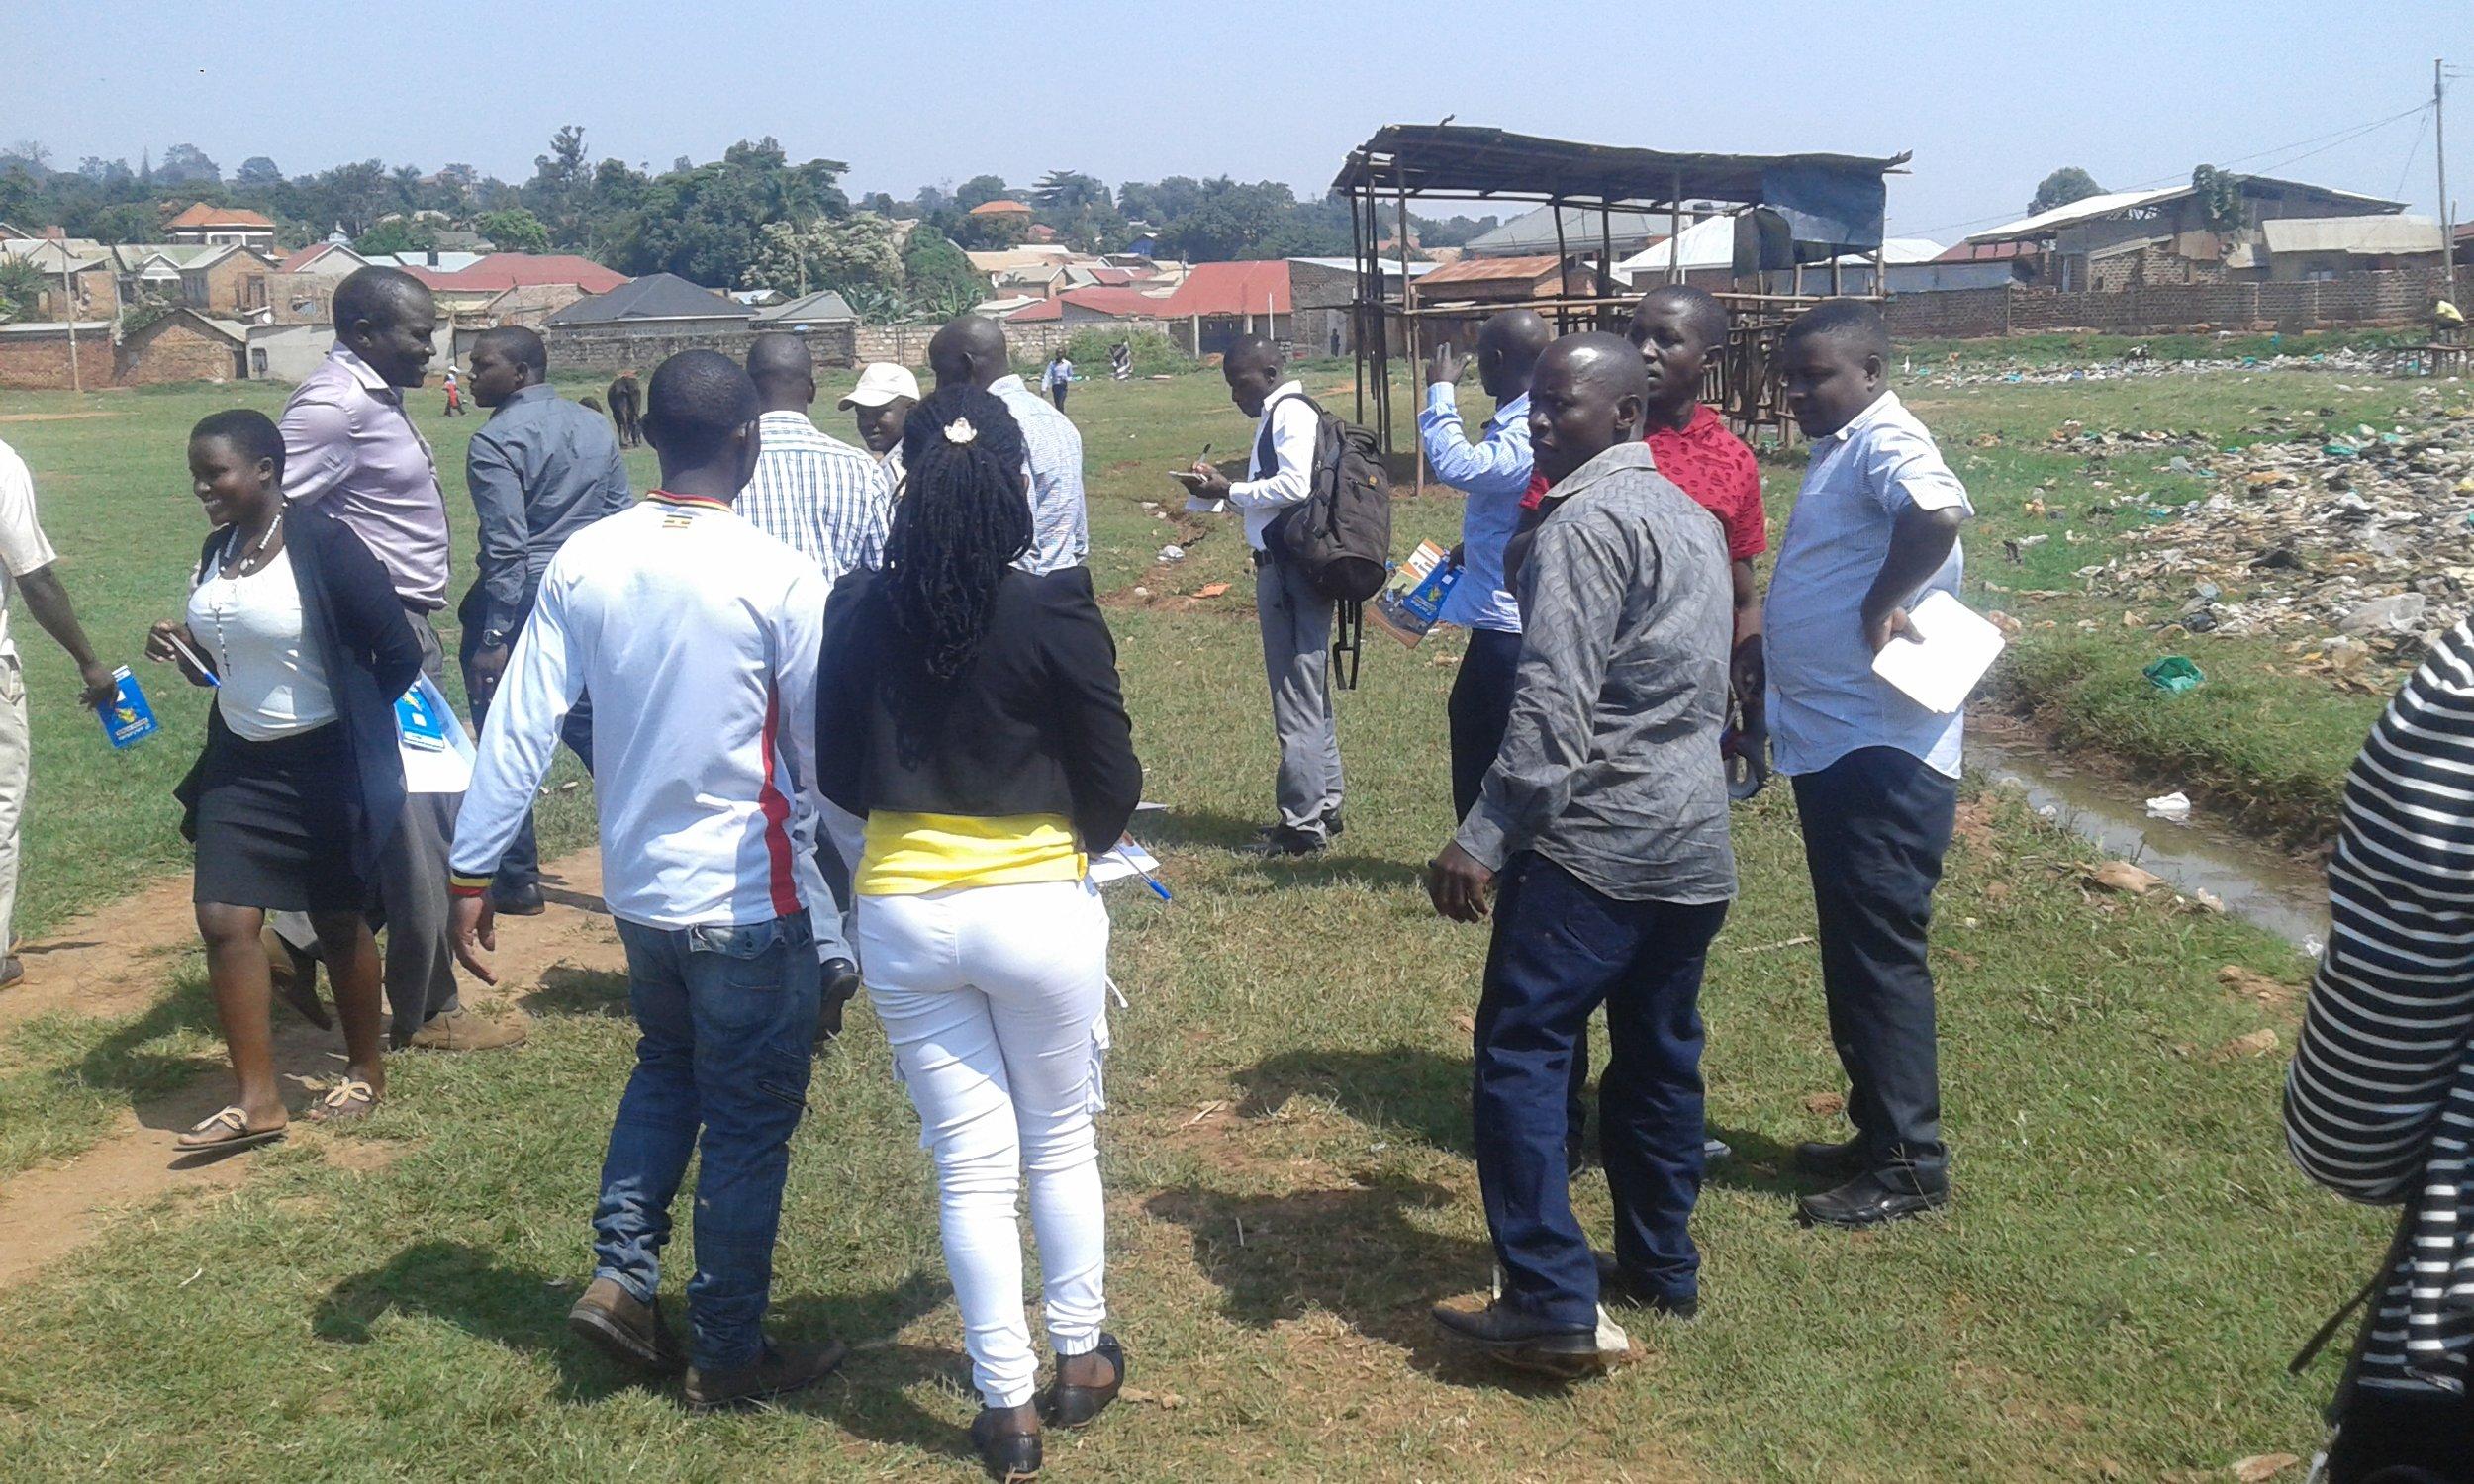 Site walk-through at Namuwongo 8th Street, Kampala, Uganda. Credit: UN-Habitat